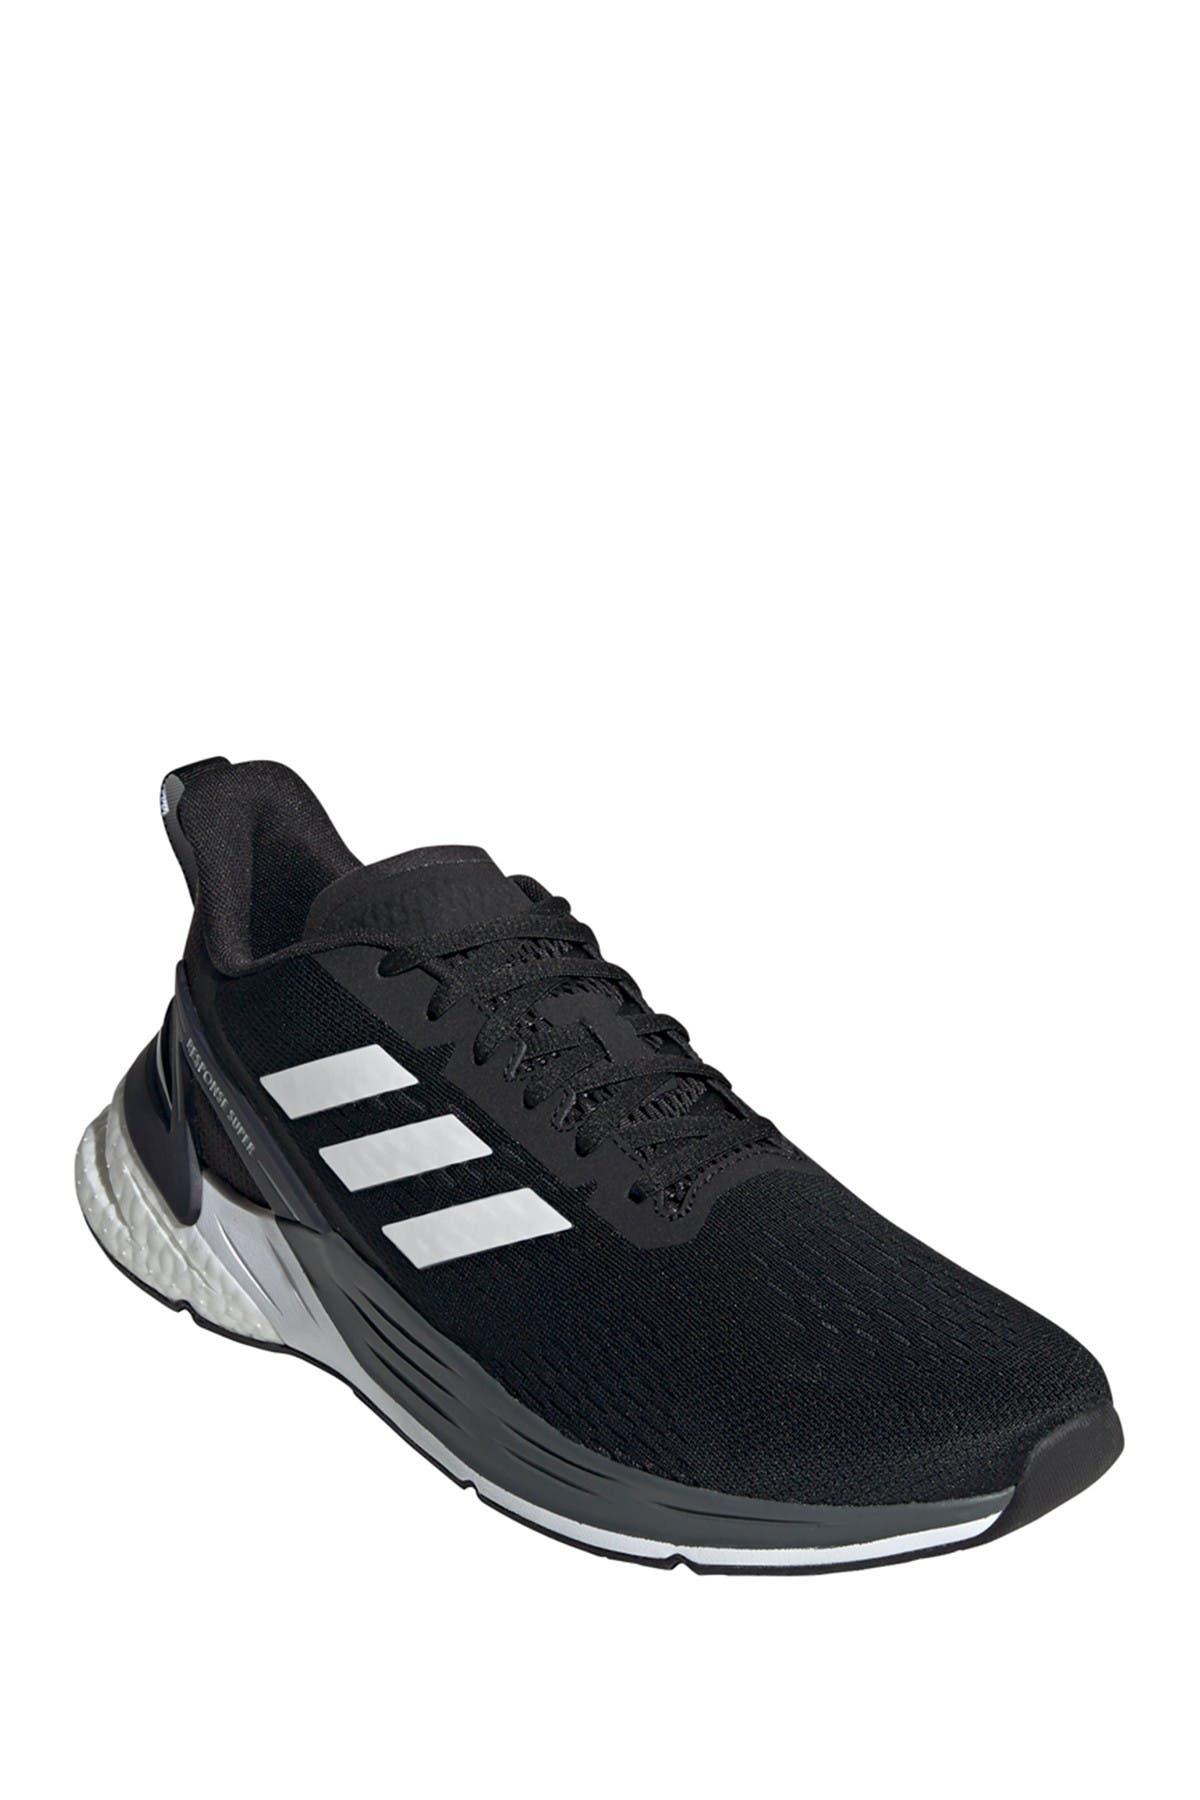 Image of adidas Response Super Mesh Sneaker